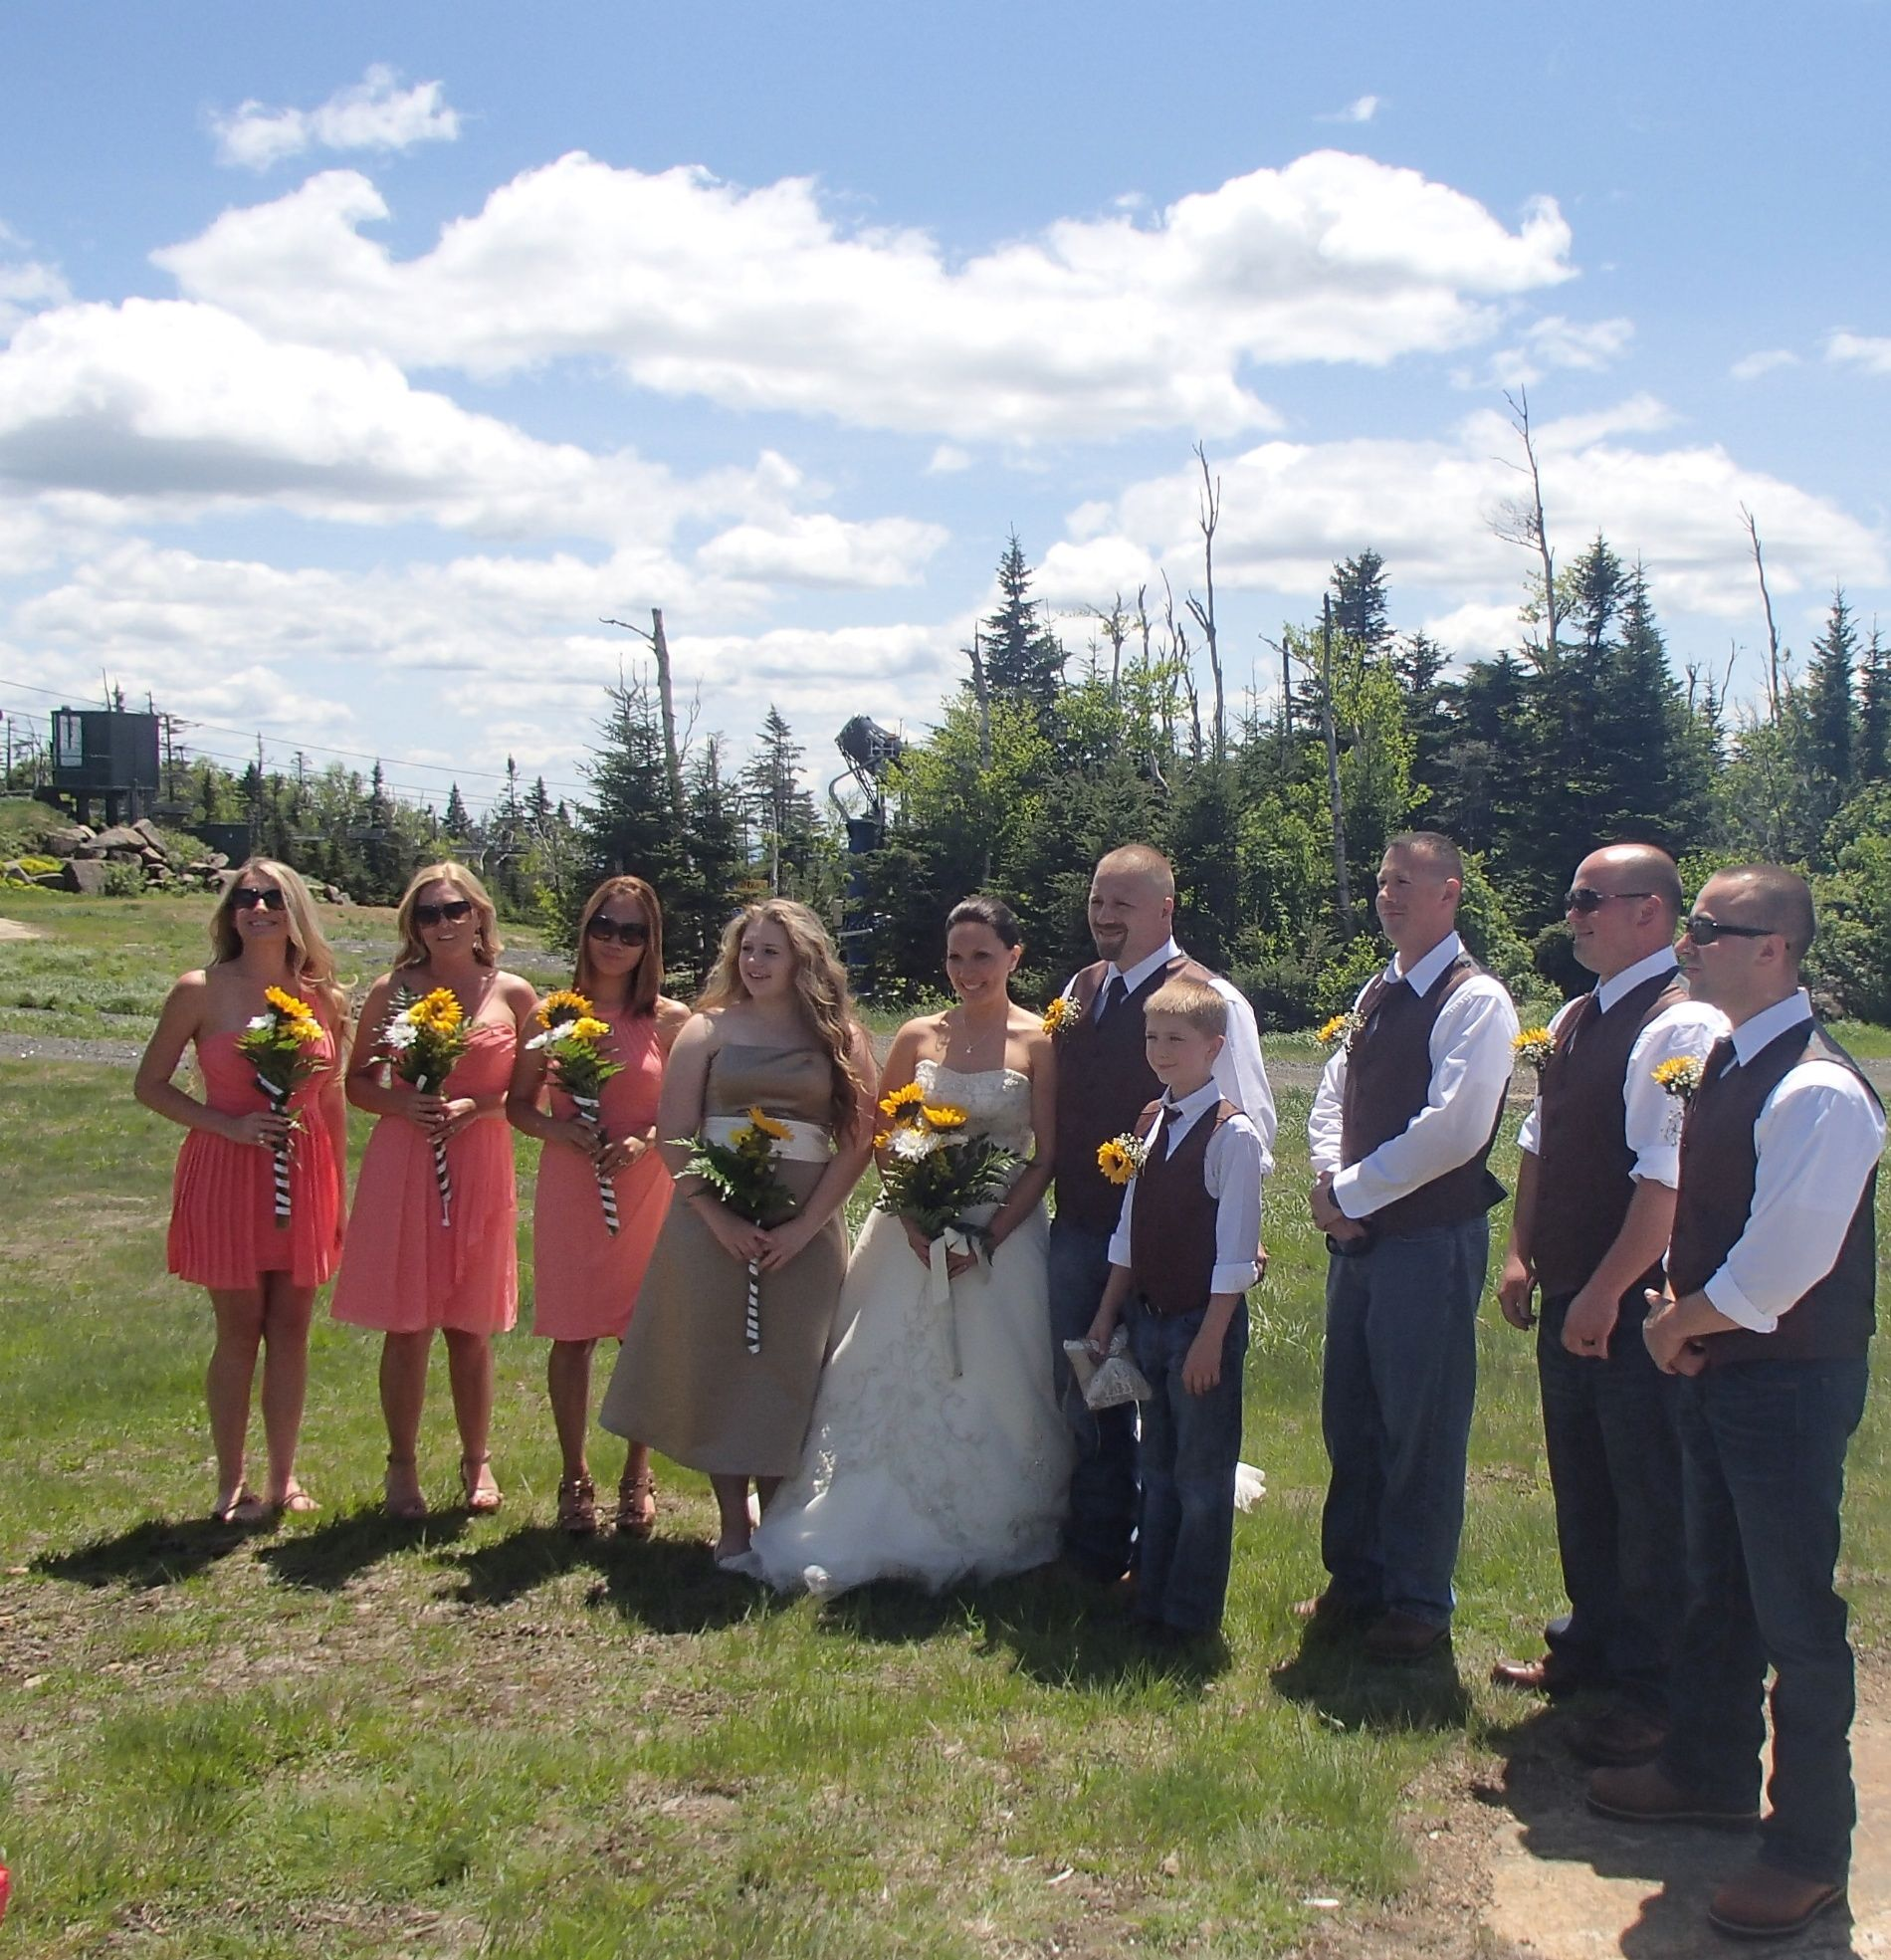 Adirondack Wedding on Gore Mountain (With images